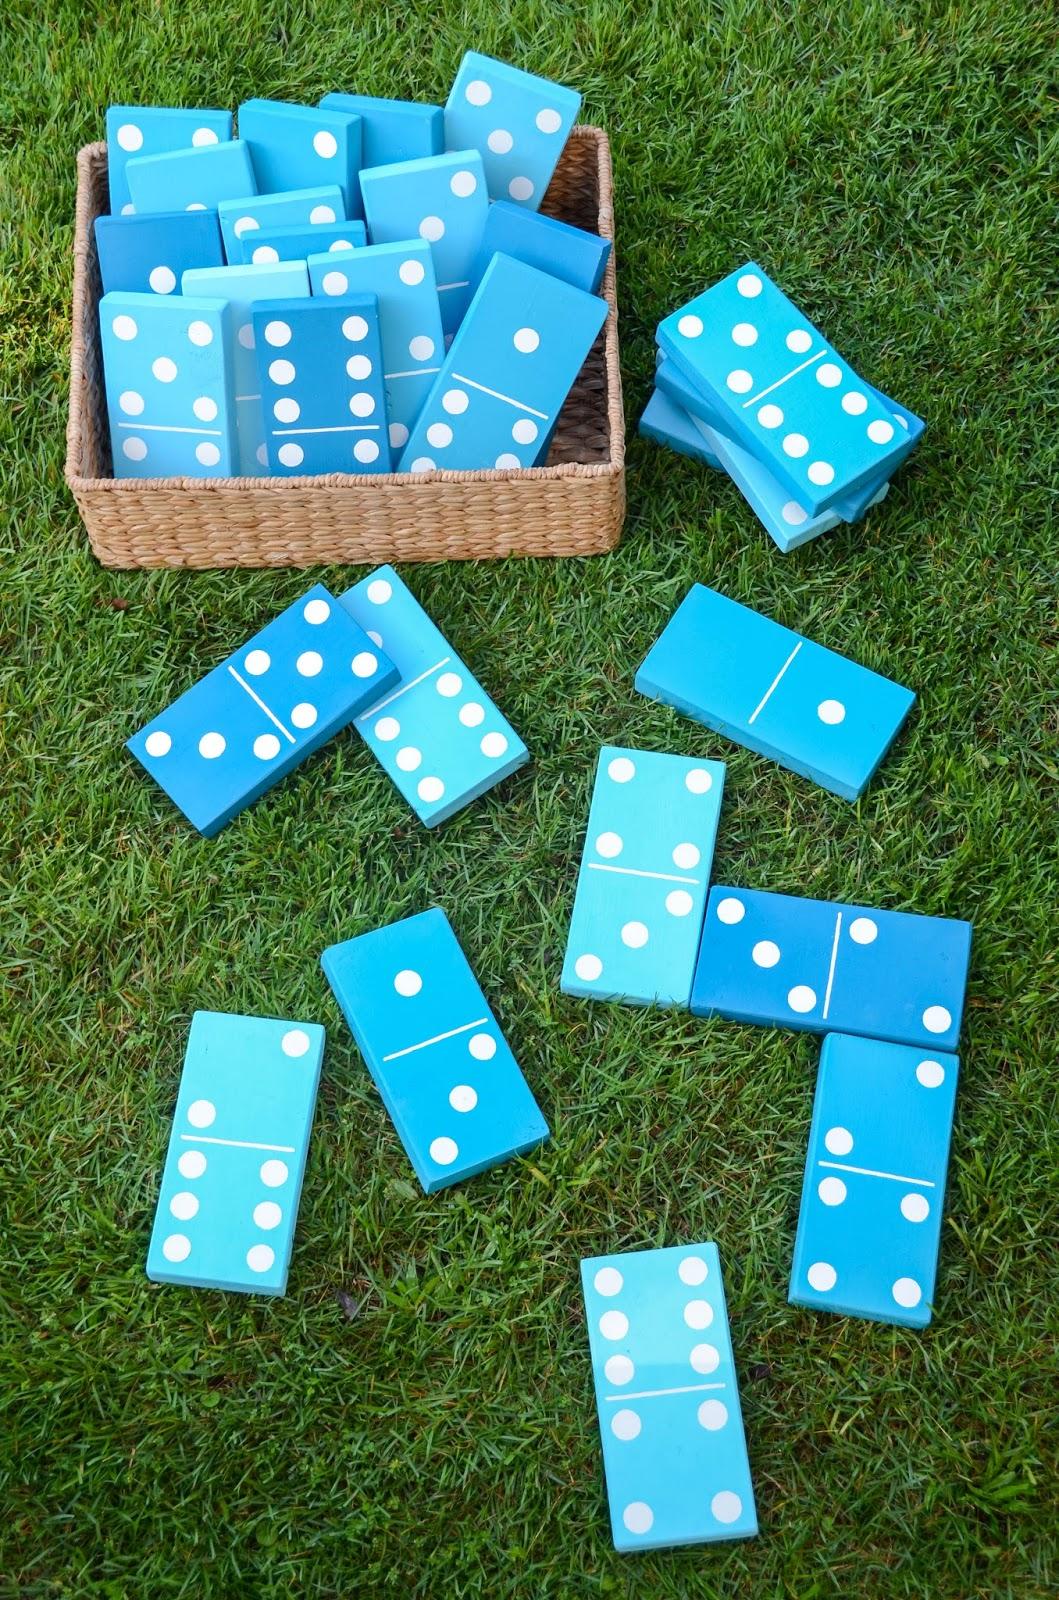 Easy Make Lawn Games